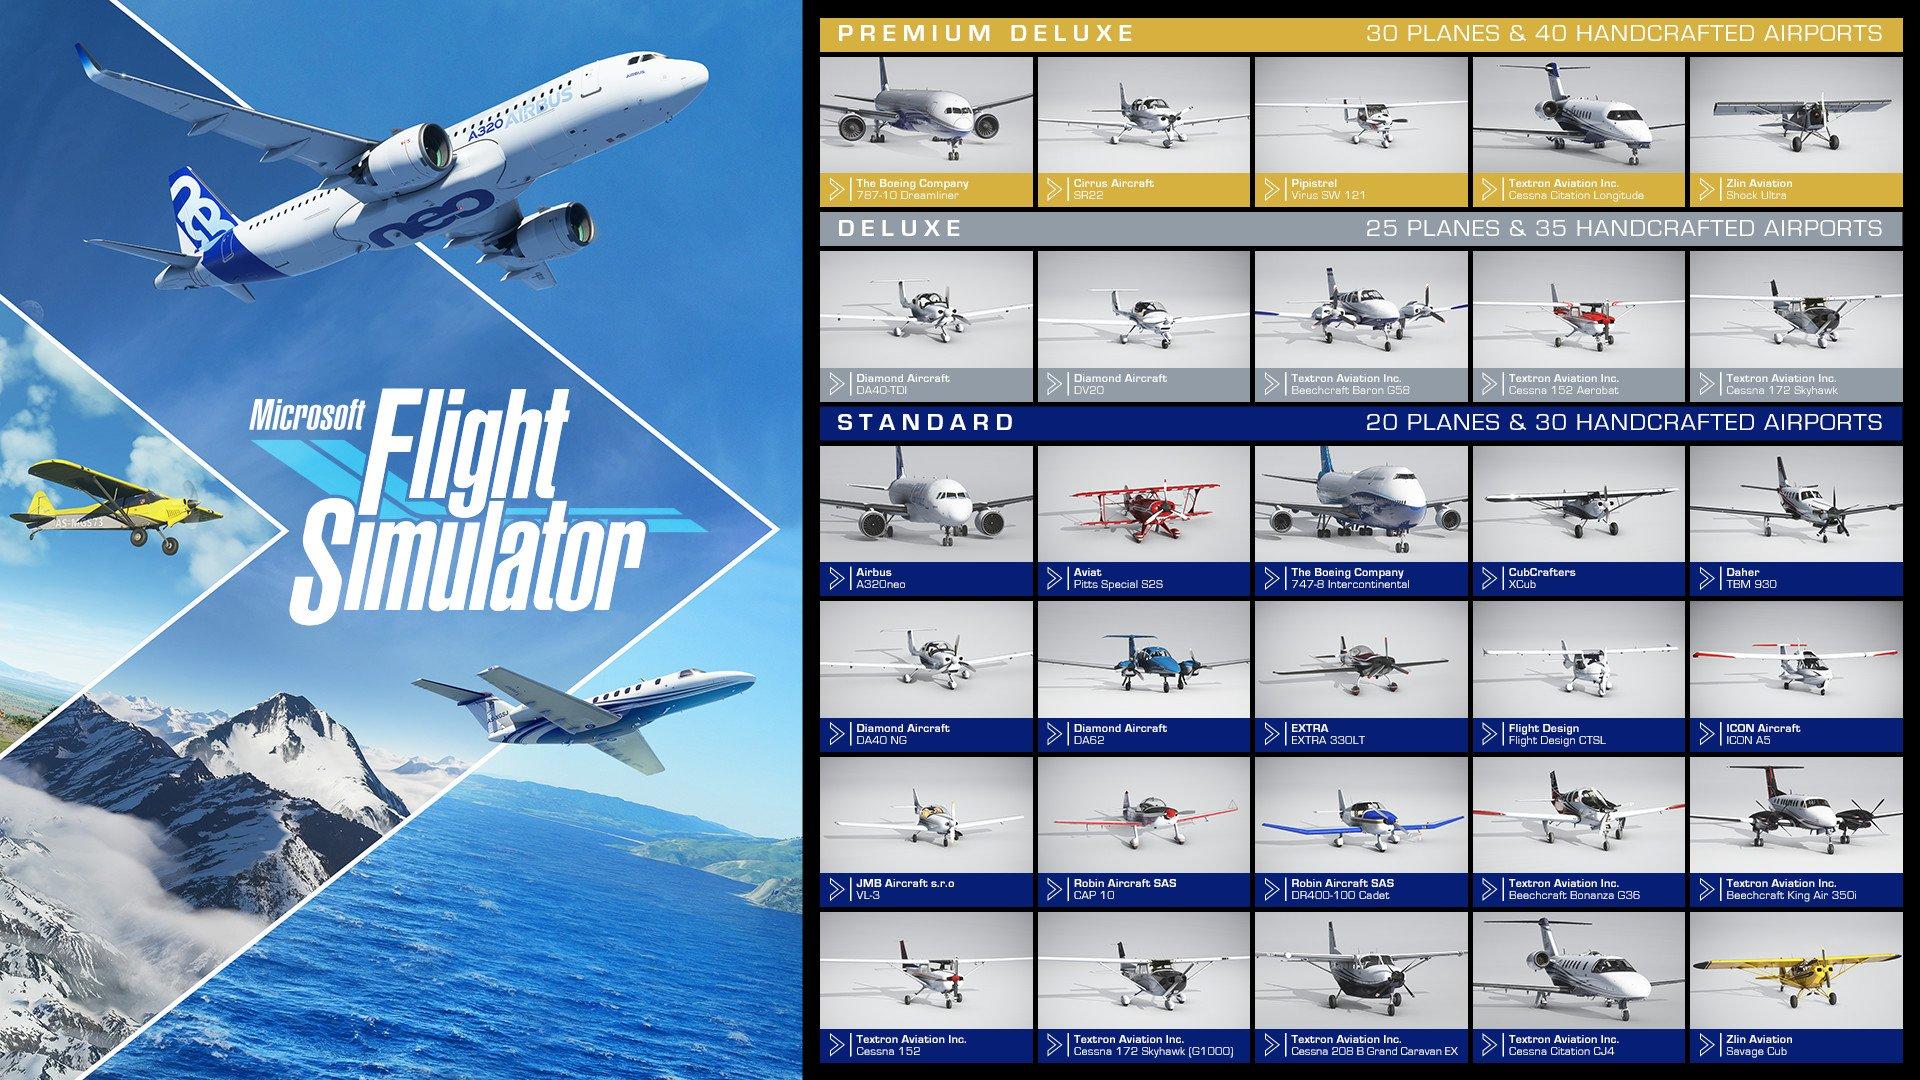 microsoft-flight-sim-aircrafts.jpg